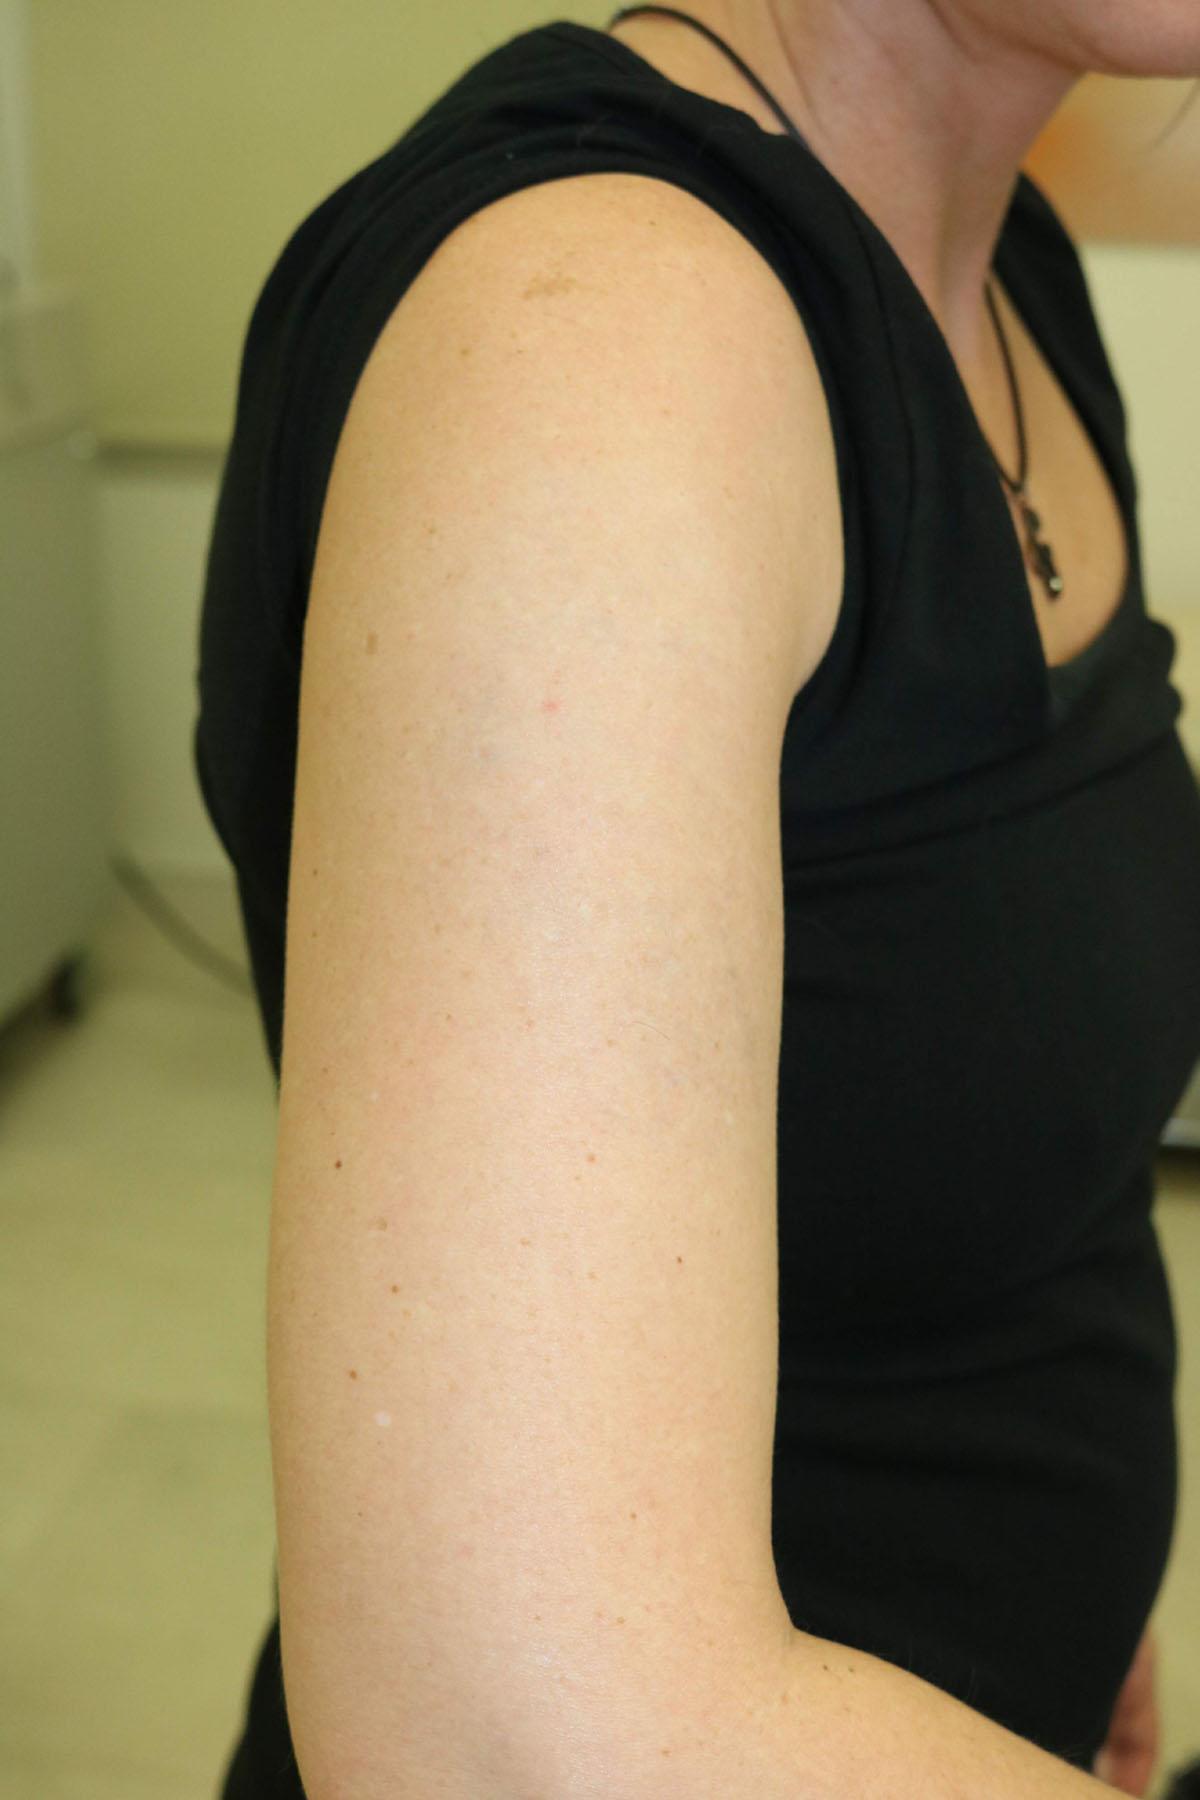 Tattooentfernung am Oberarm nach der 6. Behandlung